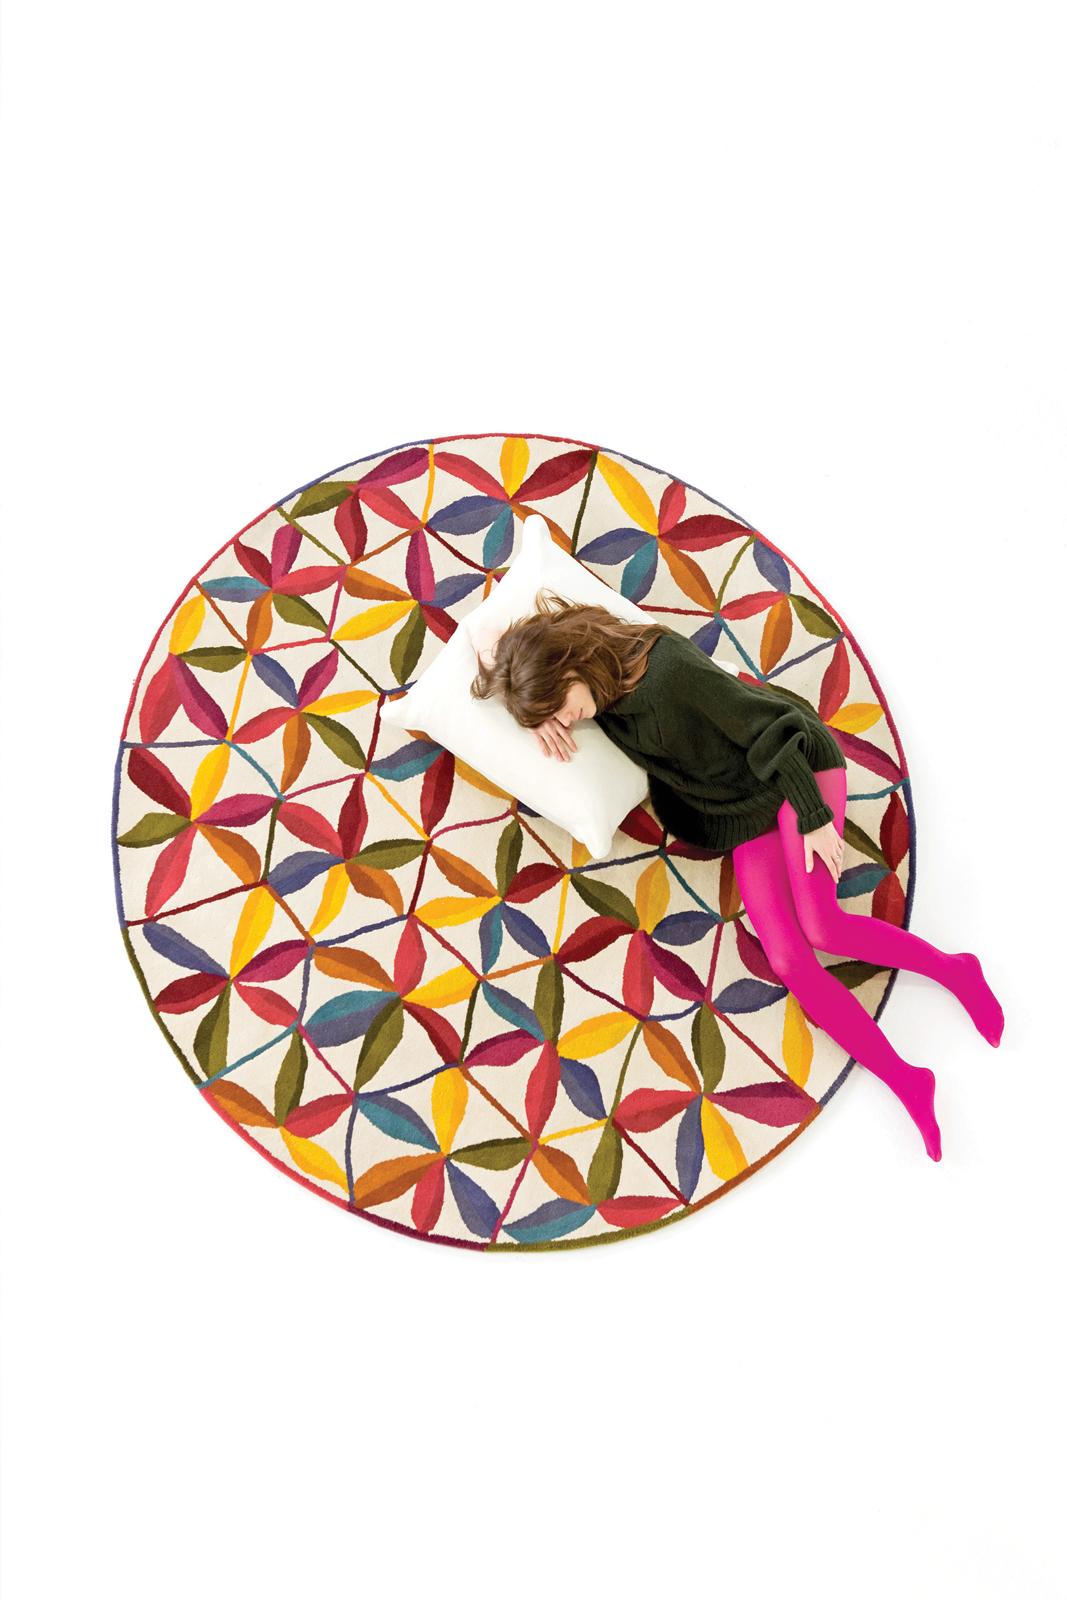 Kala rug by Nani Marquina and Care and Fair